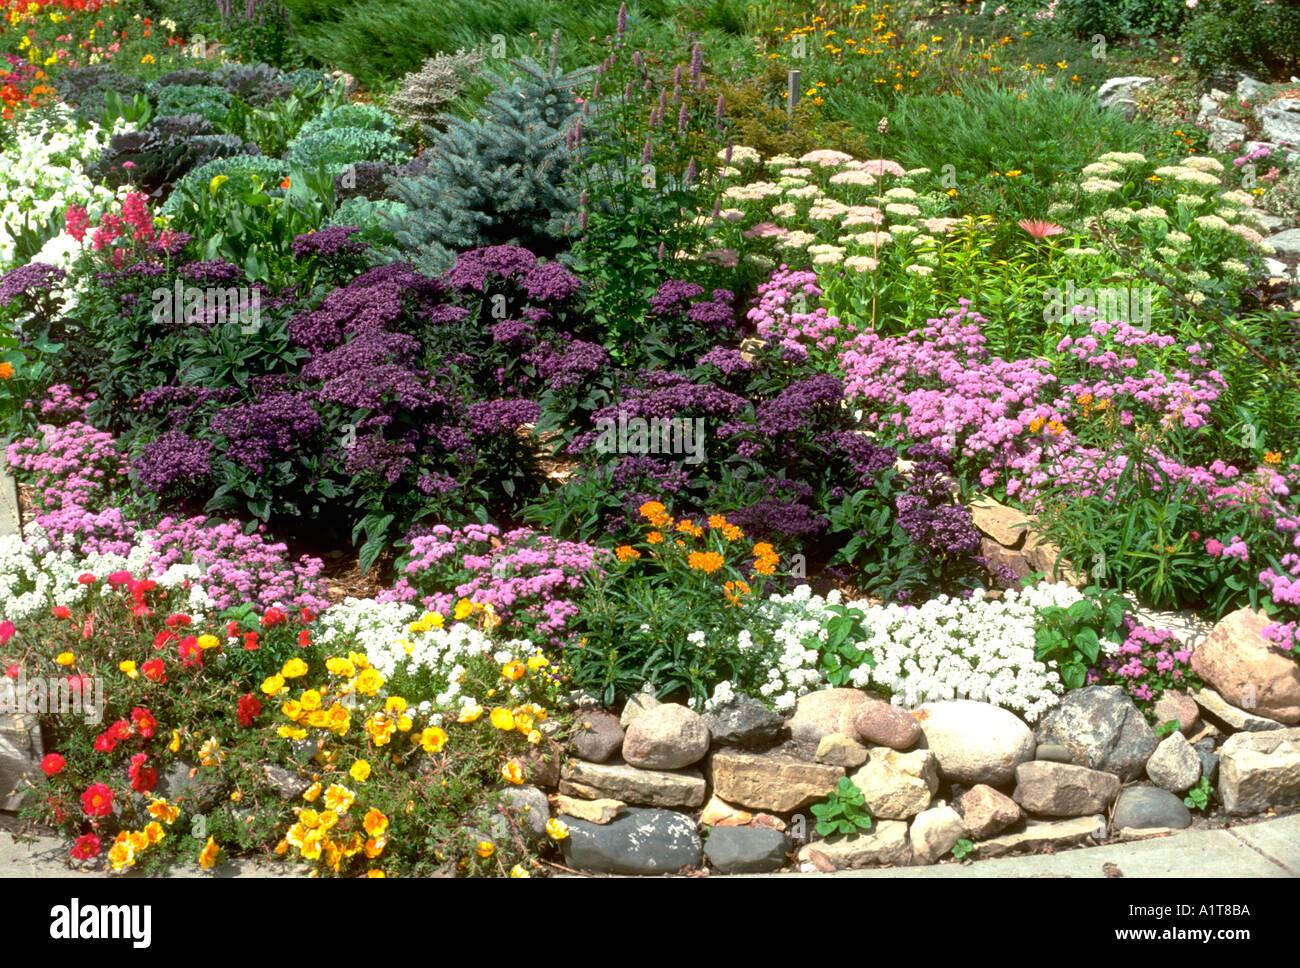 Attirant Beautiful Annual And Perennial Flower Garden Lined With A Rock Border.  Edina Minnesota MN USA